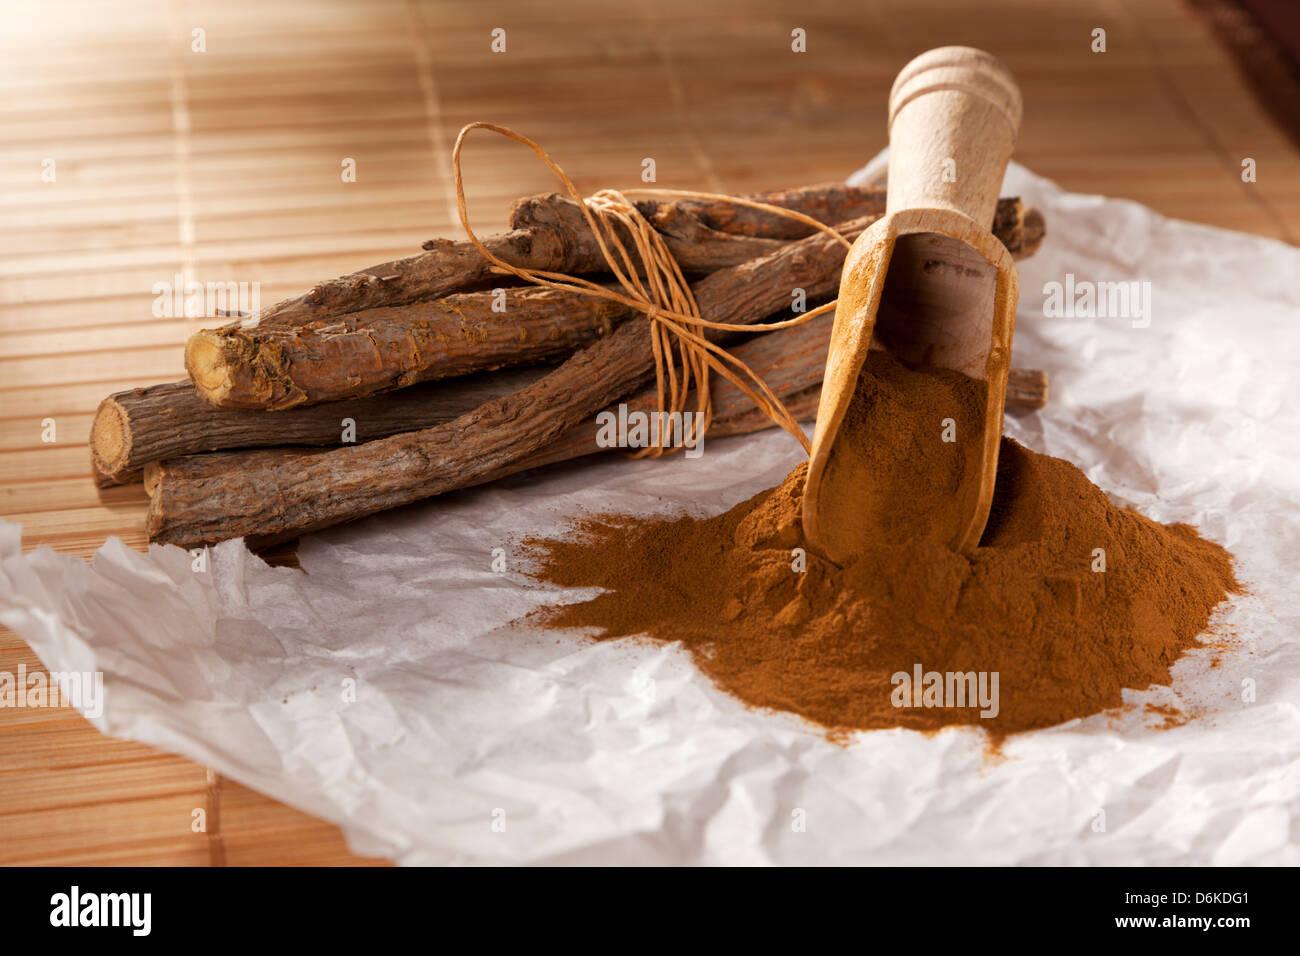 Ground licorice and liquorice roots - Stock Image